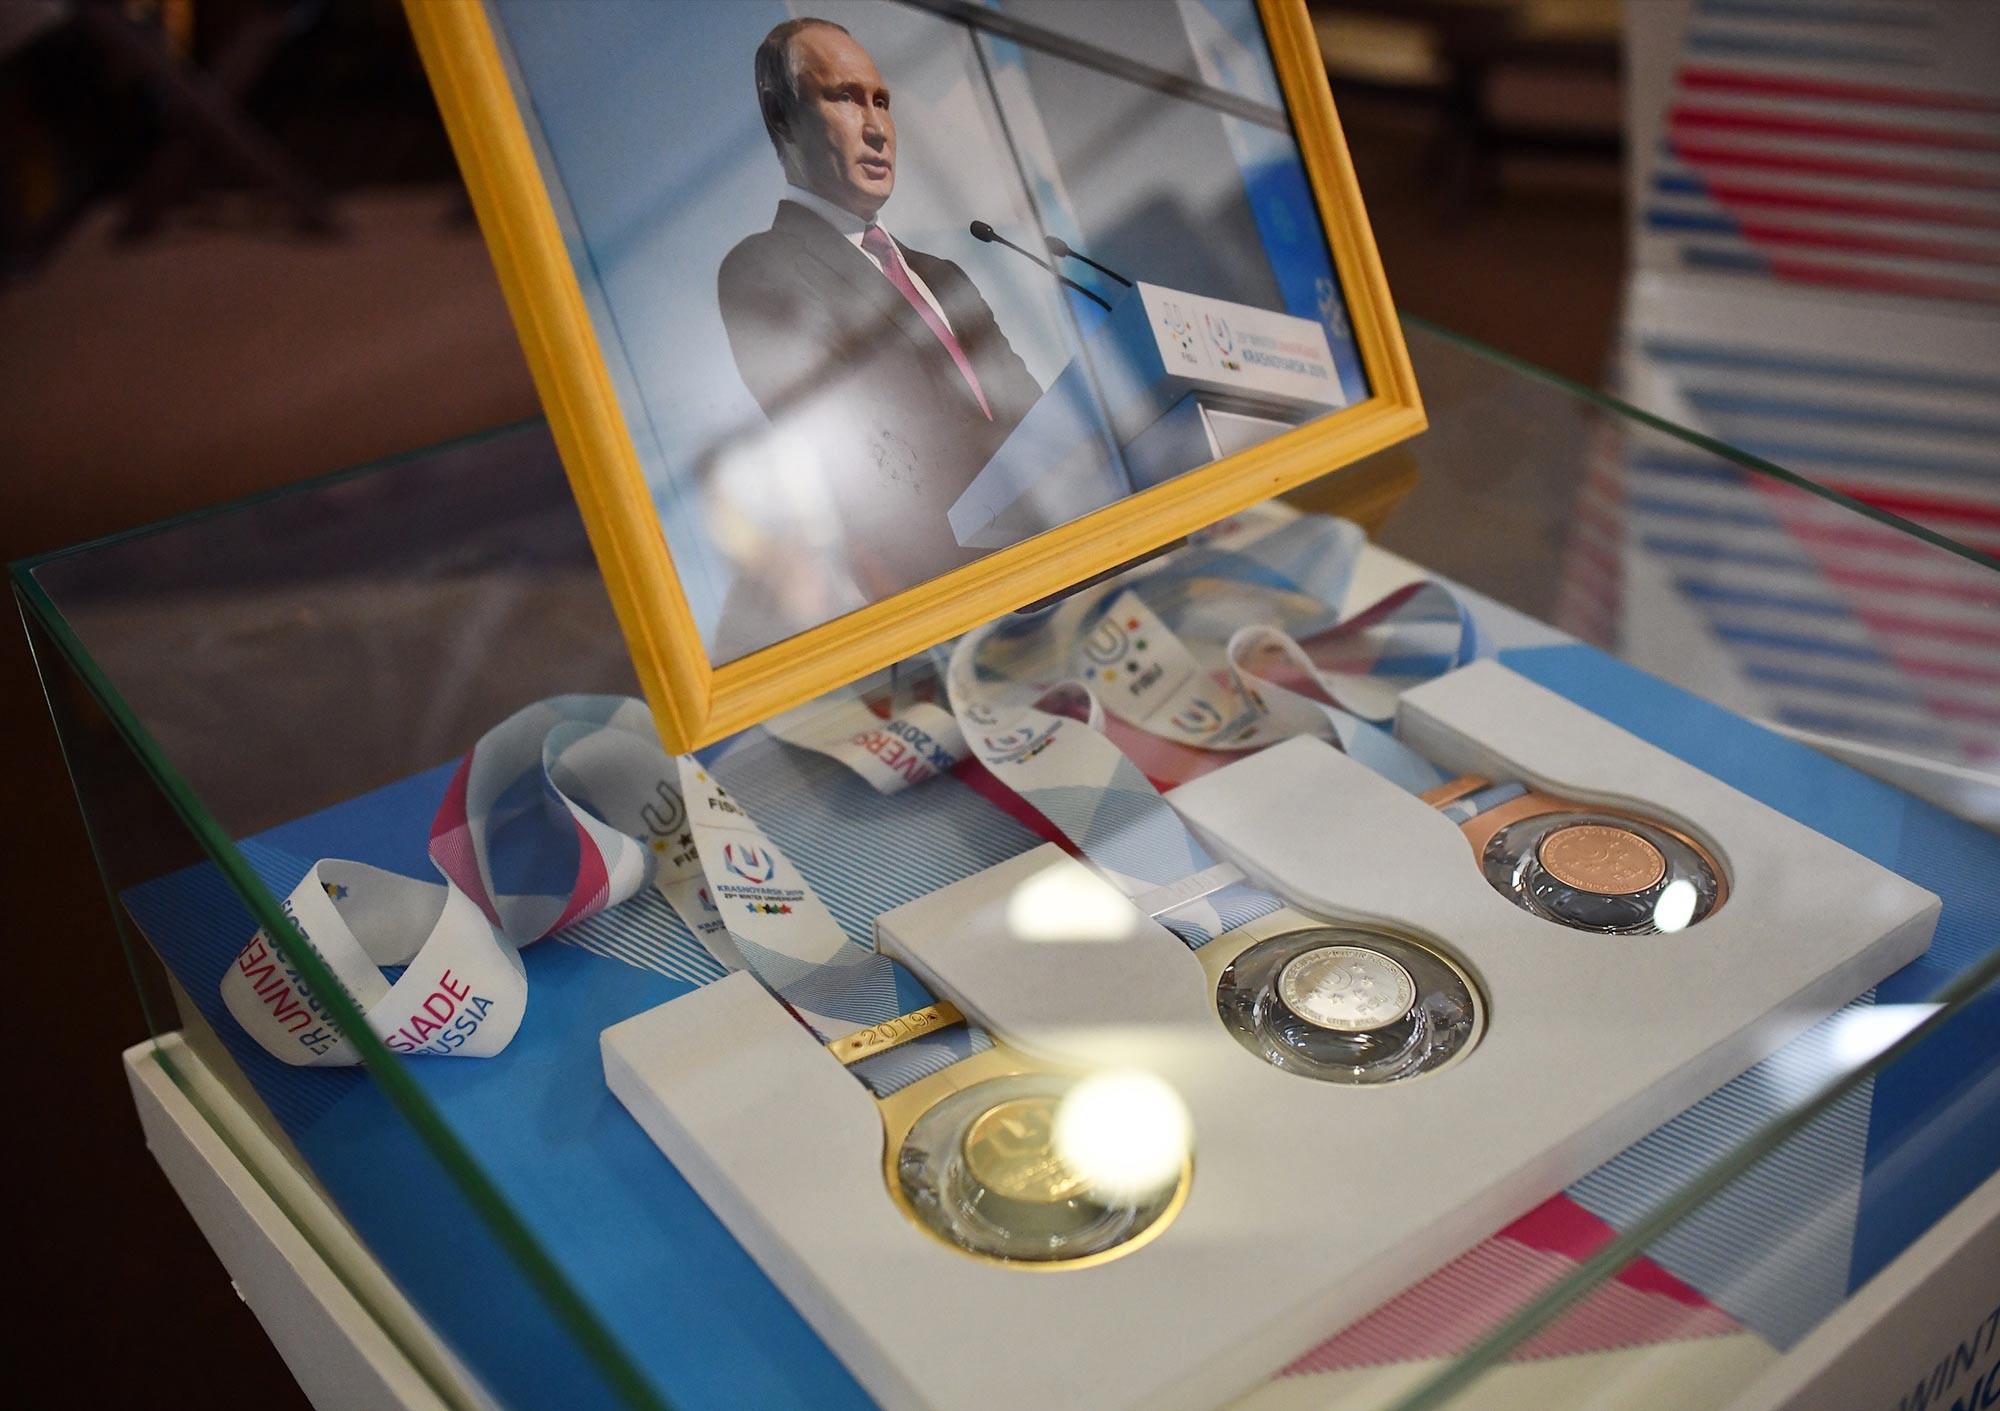 Krasnoyarsk 2019 memorabilia gifted to supporting organisations